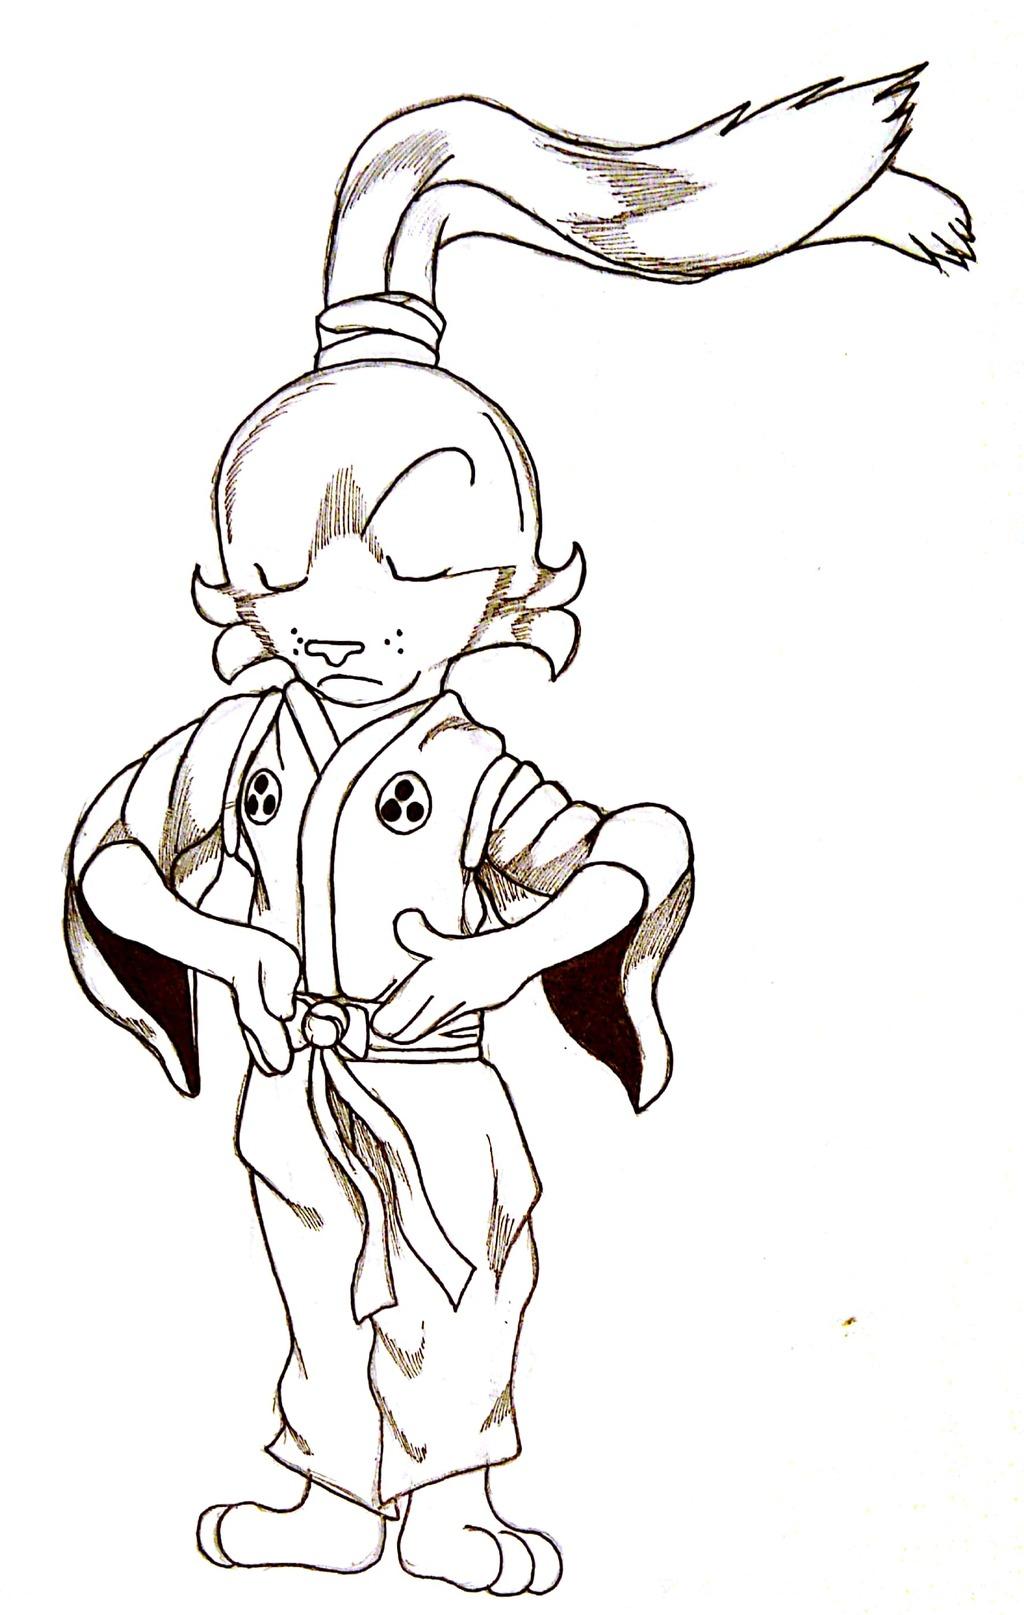 Most recent image: Usagi Miyamoto